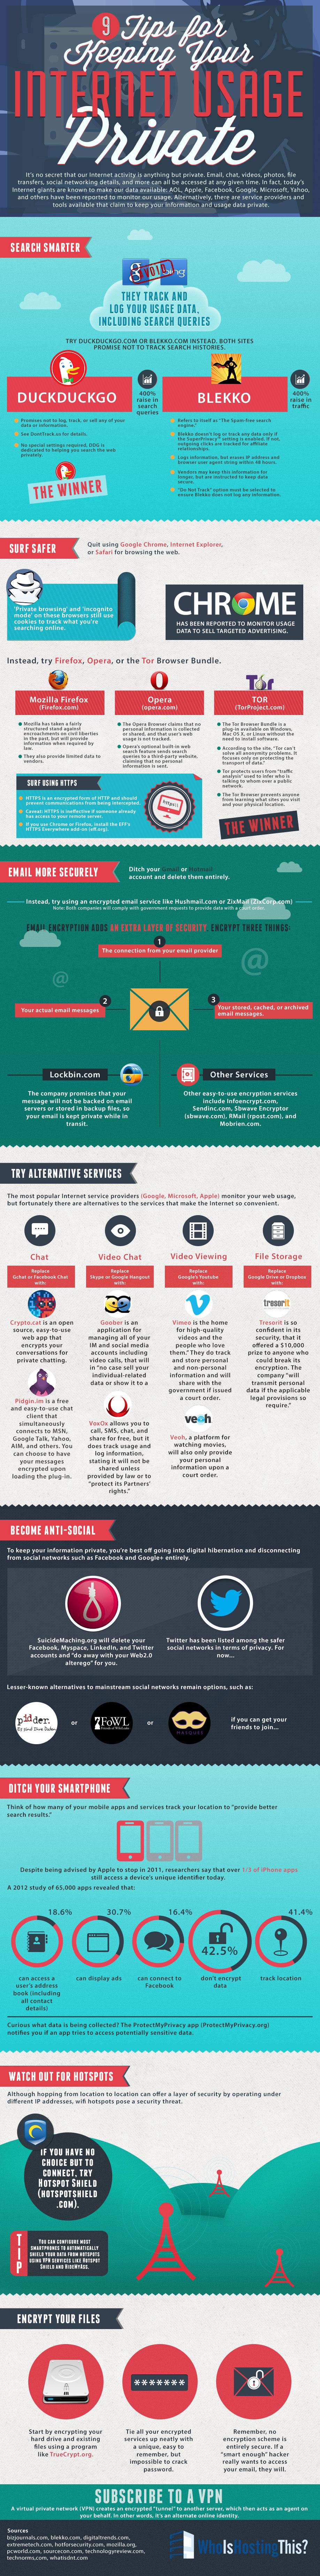 9-Tips-For-Internet-Privacy-branded